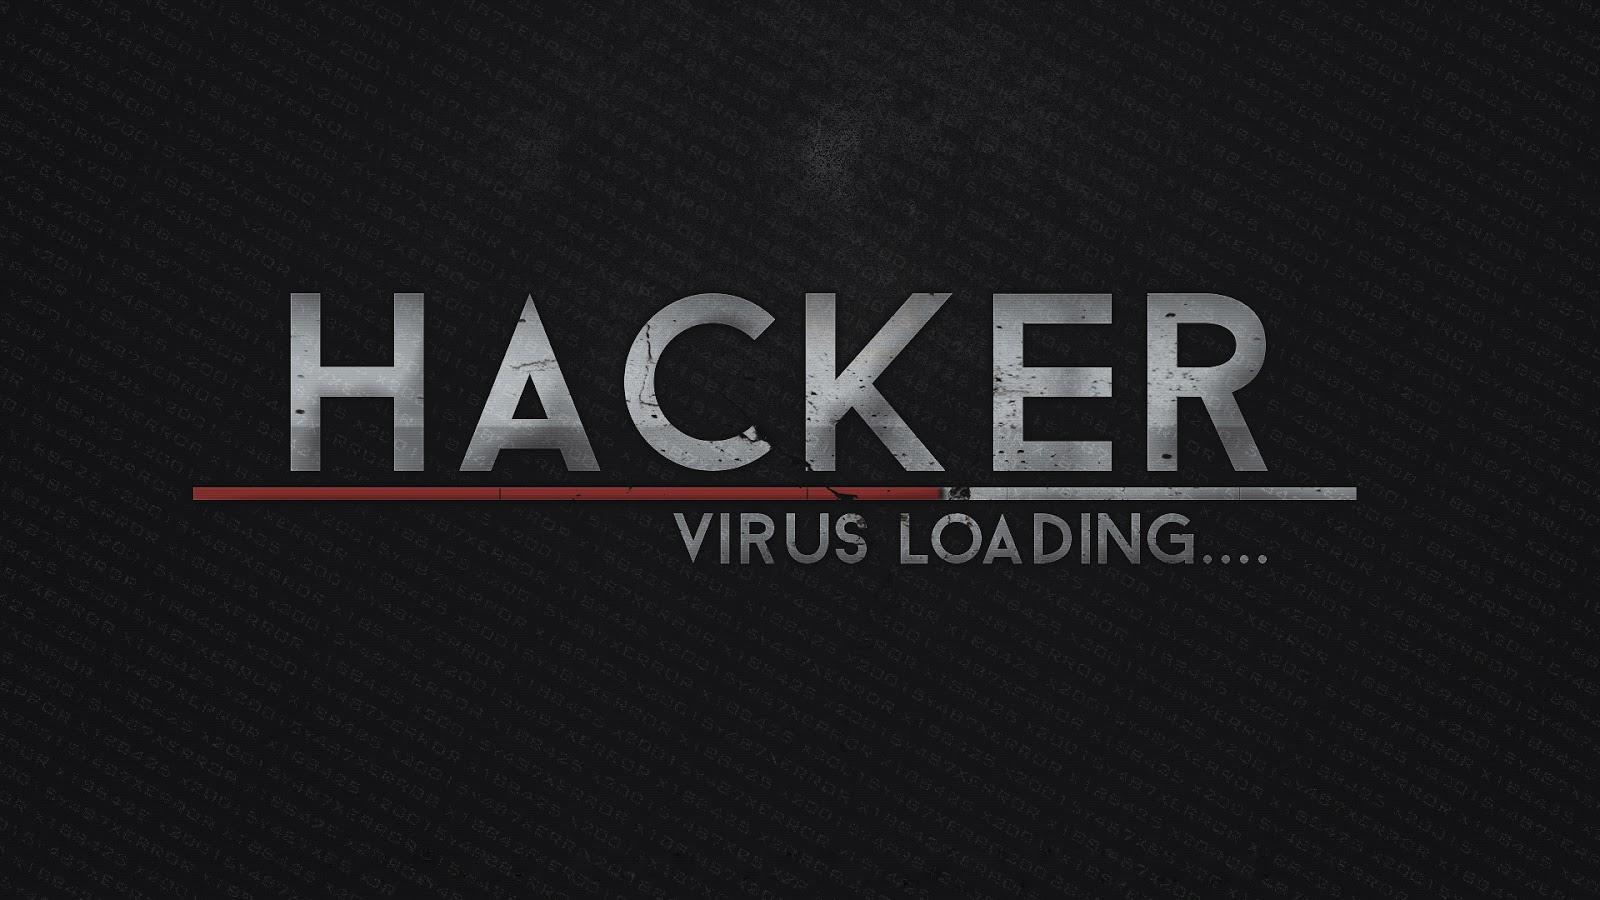 Hackers Wallpaper HD By Pcbots - Part-IX ~ PCbots Labs (Blog)